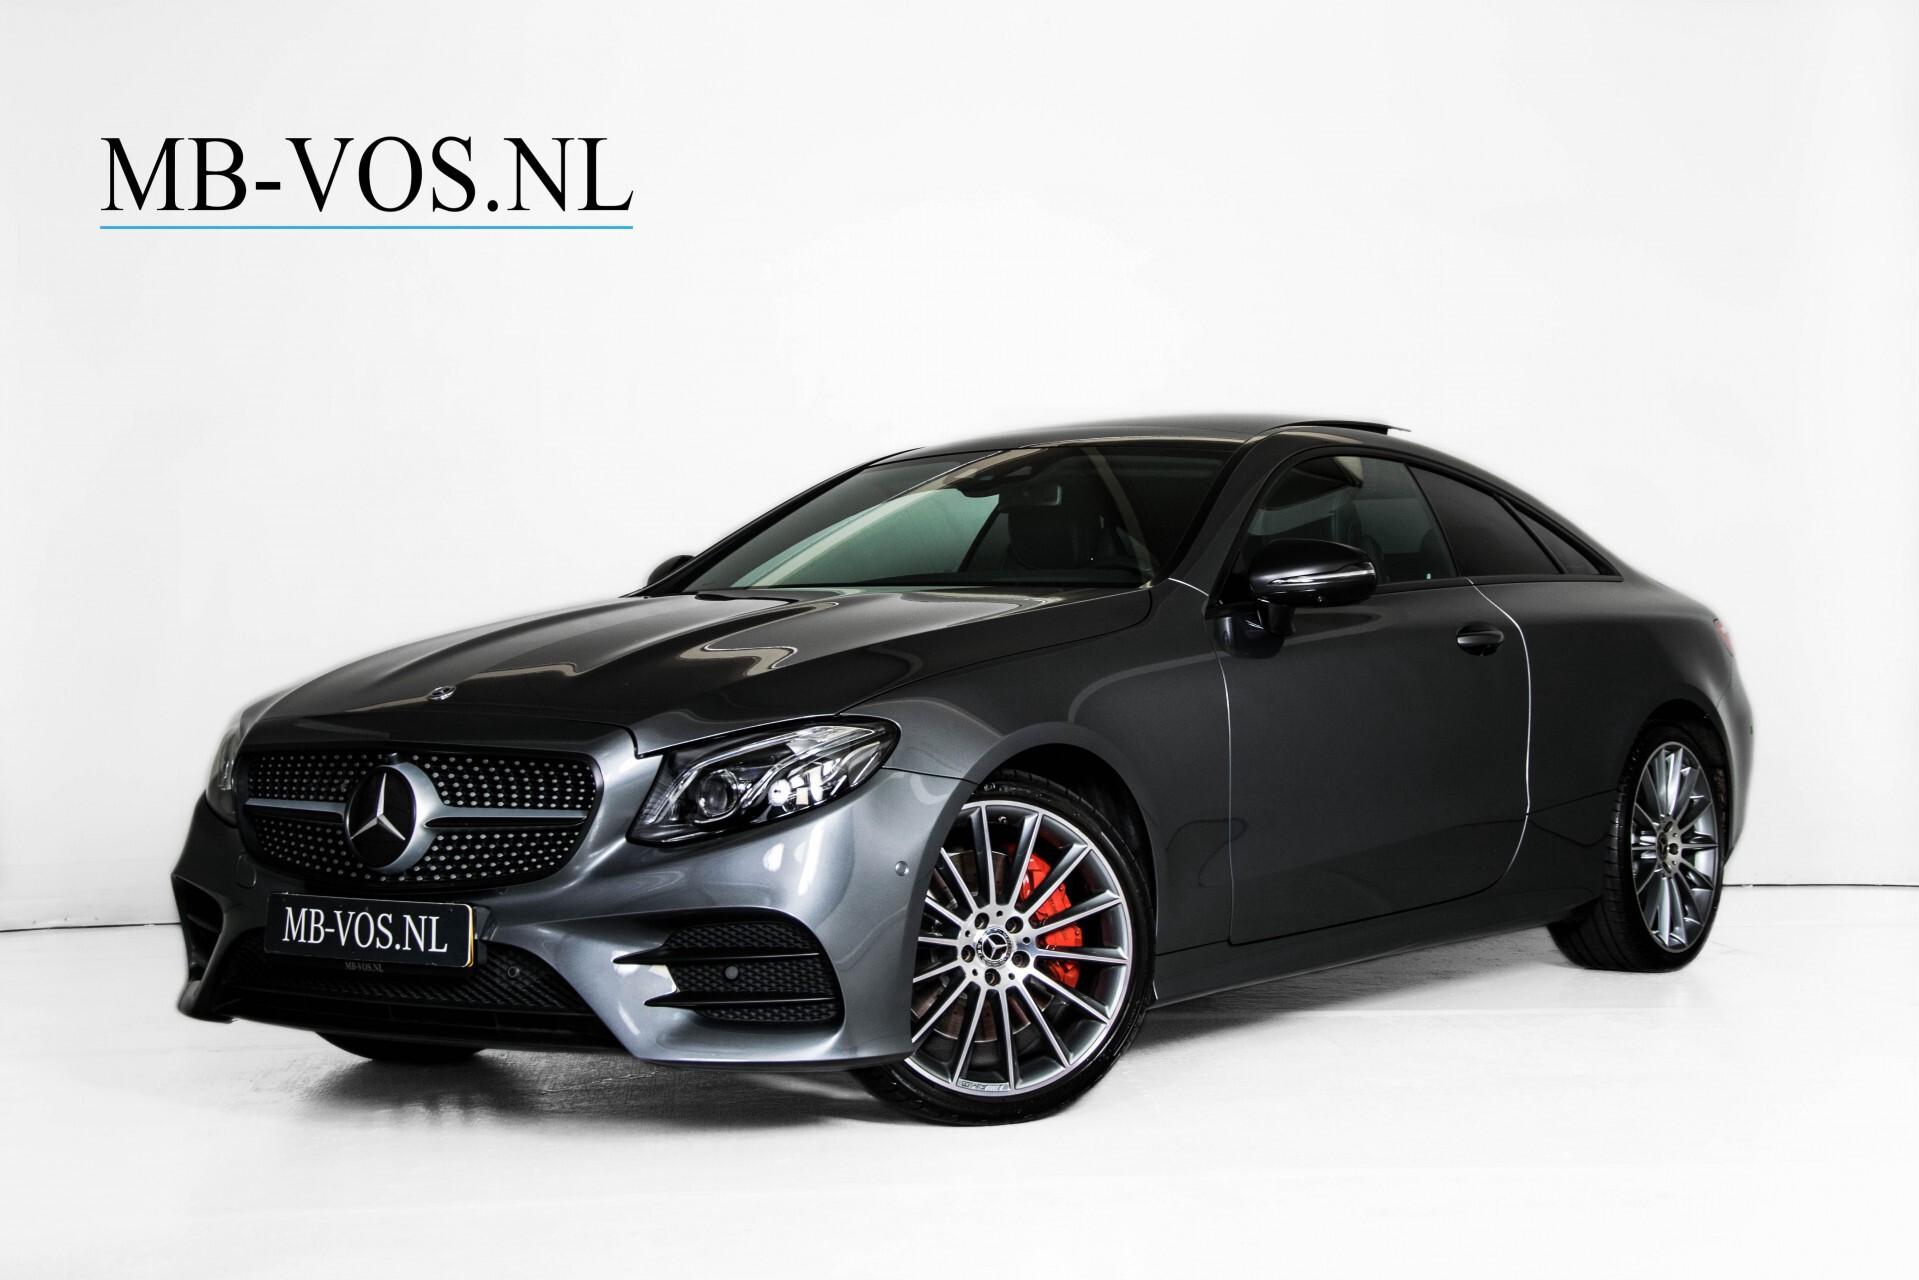 Mercedes-Benz E-Klasse Coupé 300 AMG Luchtvering/Distronic/Keyless/Designo/Burmester/Stoelkoeling Aut7 Foto 1